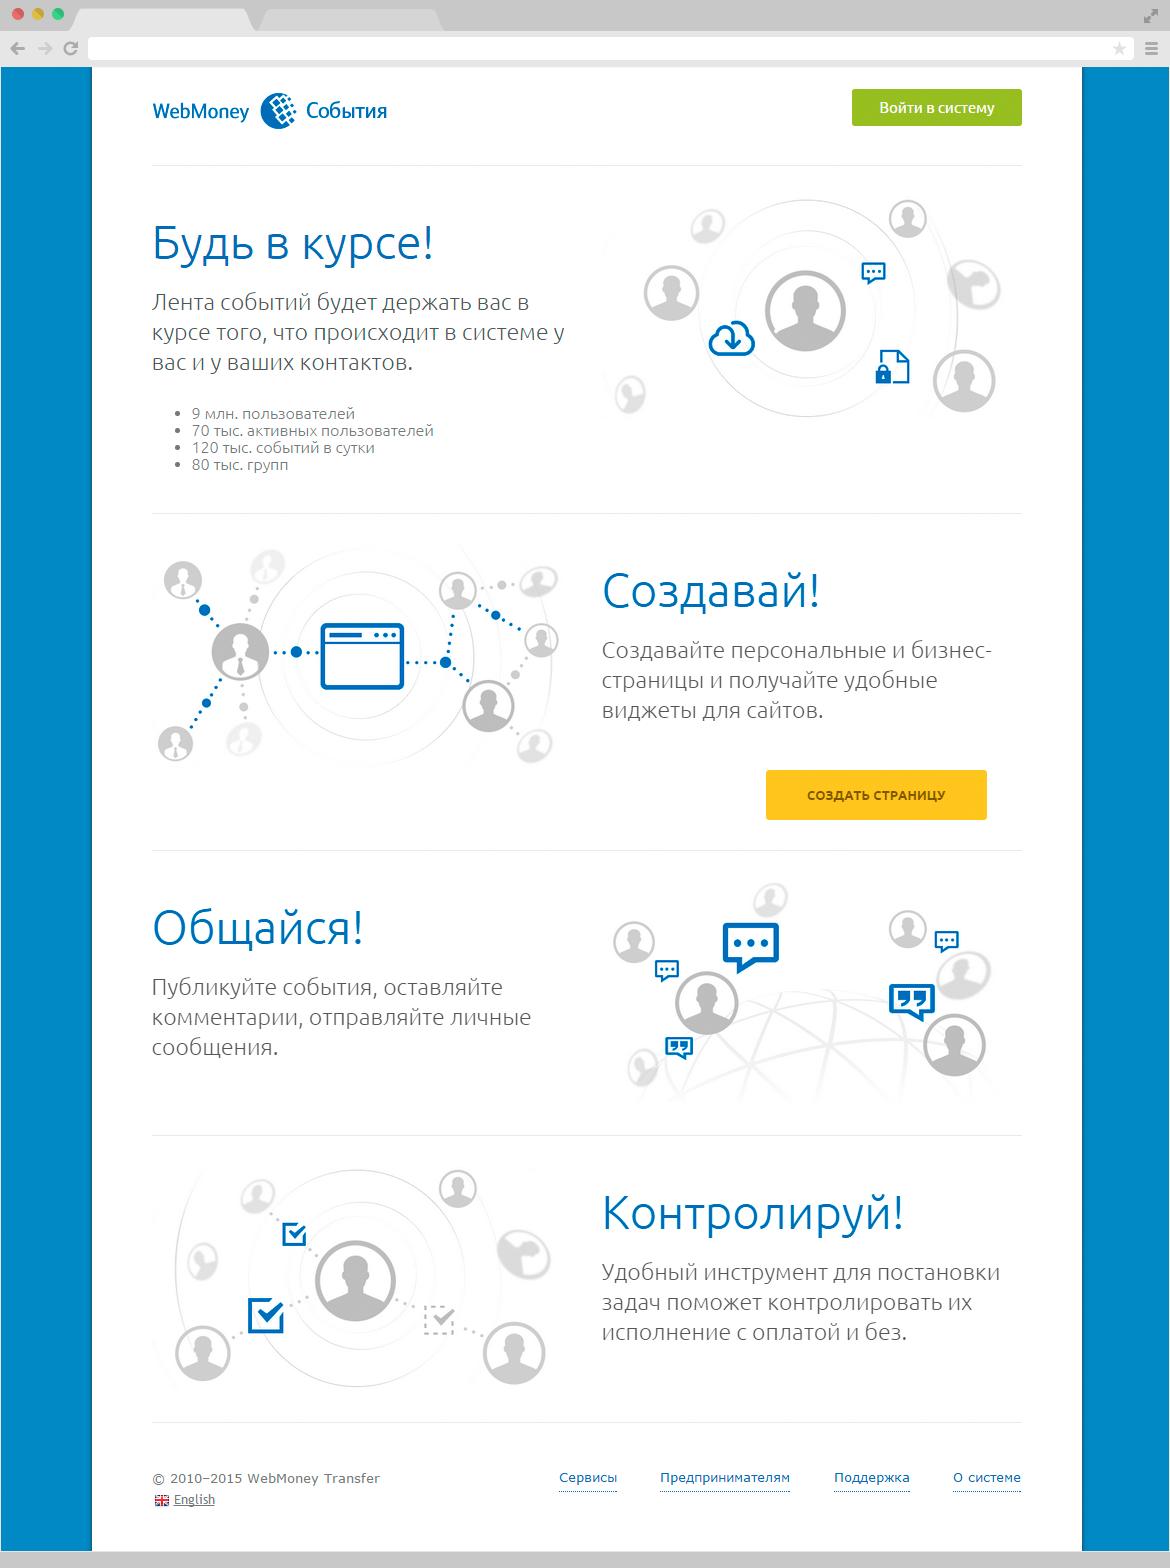 Events,webmoney,re-design,landing,page,landingpage,Web,Interface